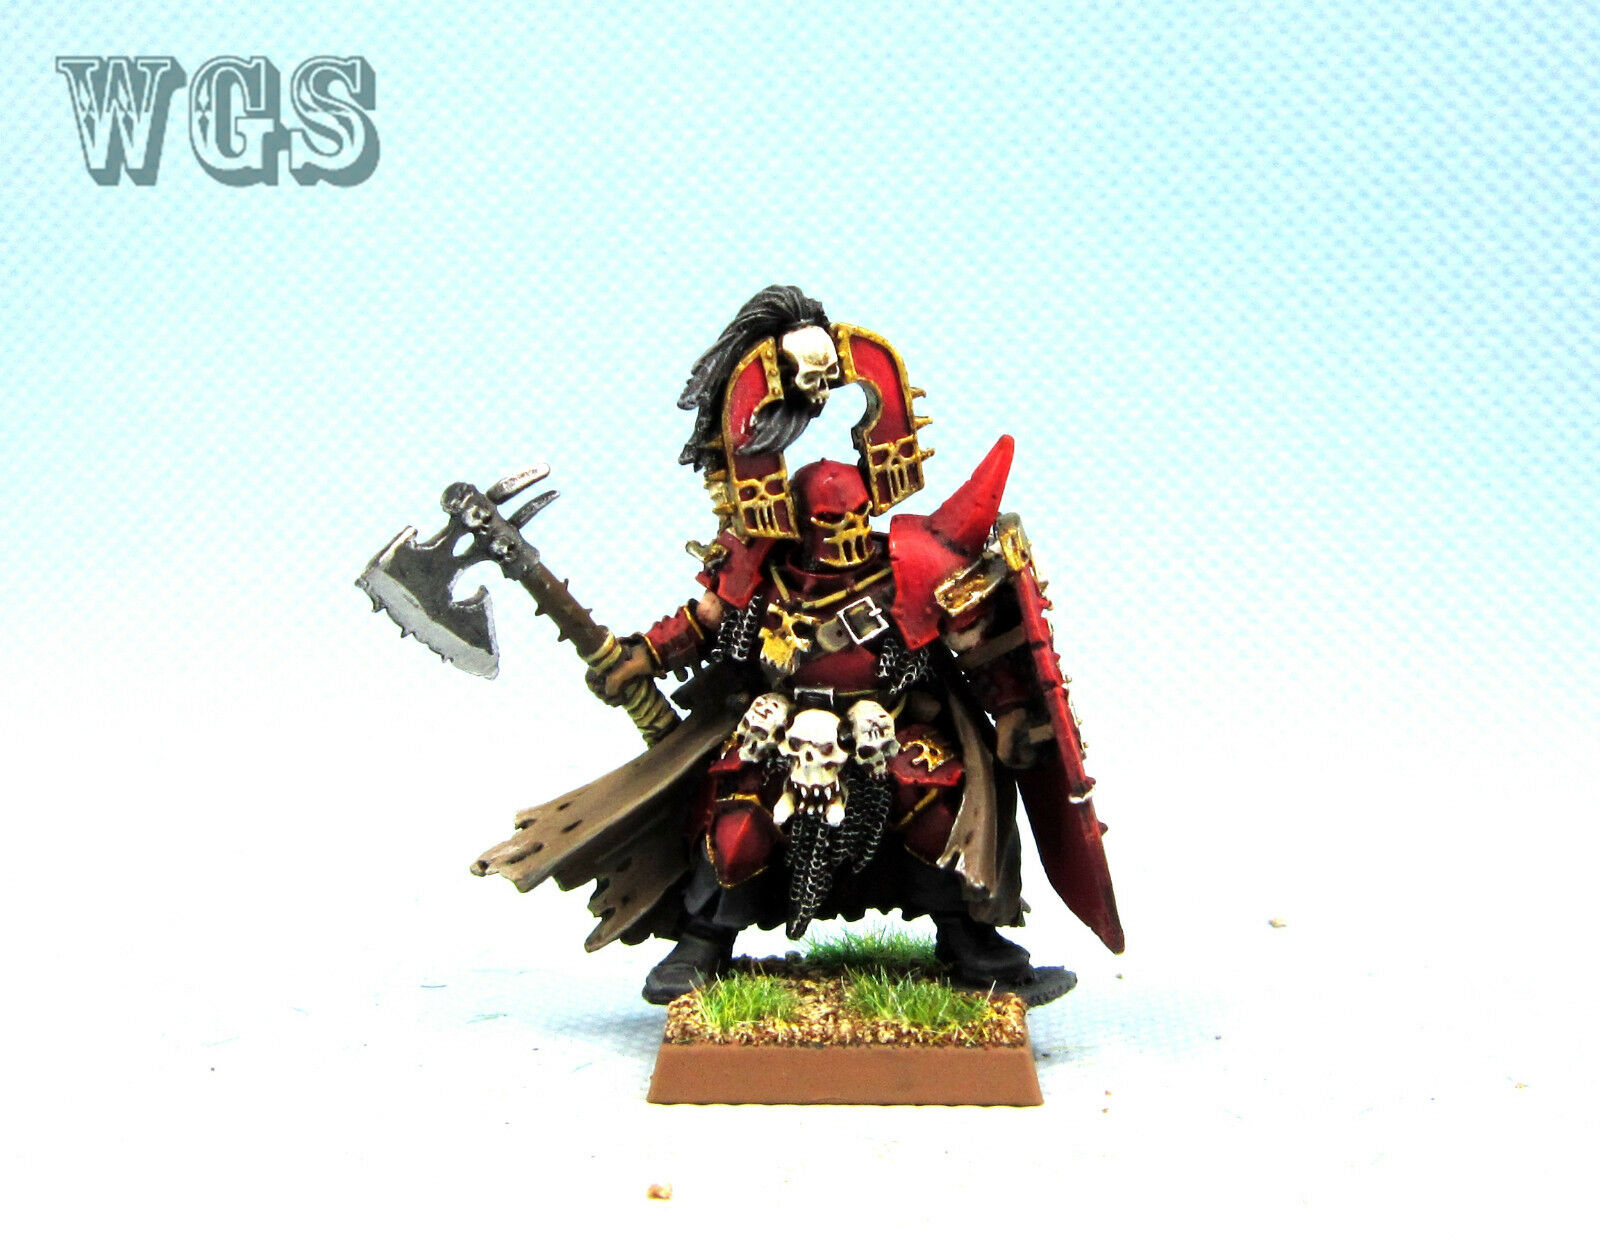 25mm Warhammer Fantasy un Pintado guerreros del caos khorne Chaos Lord WC036